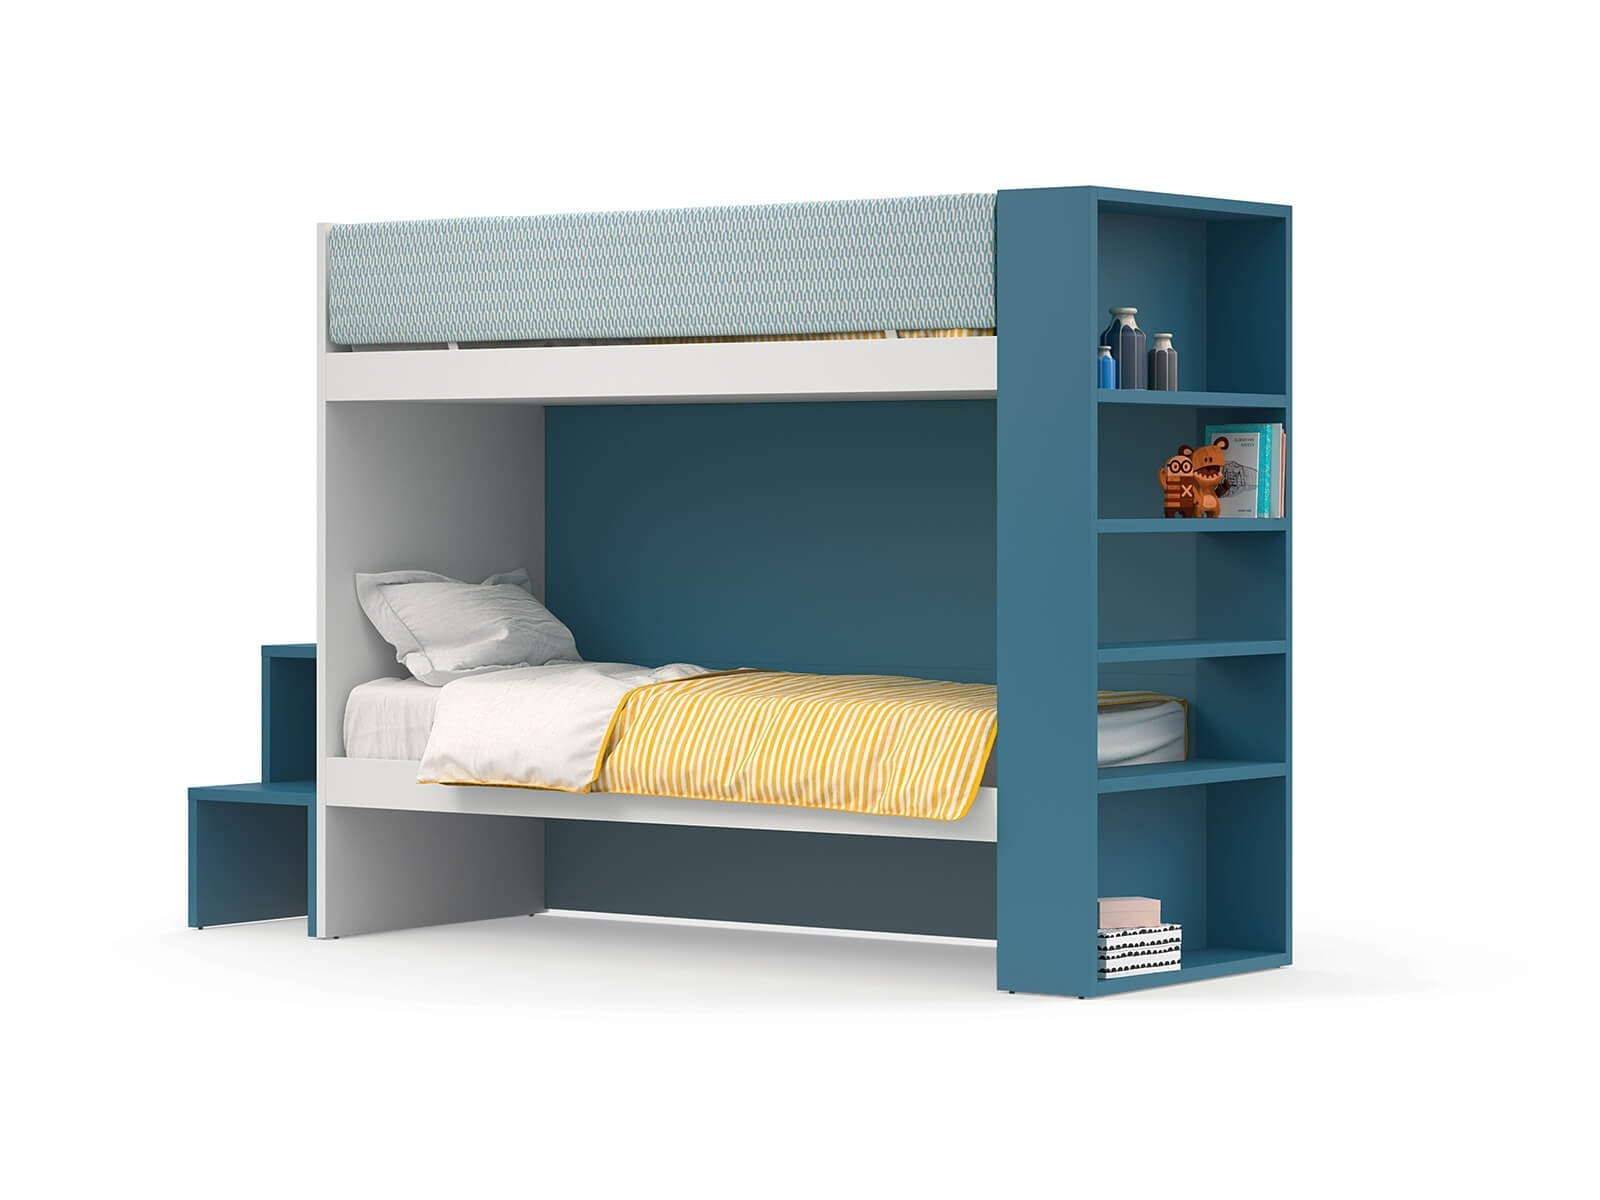 Nuk bunk bed